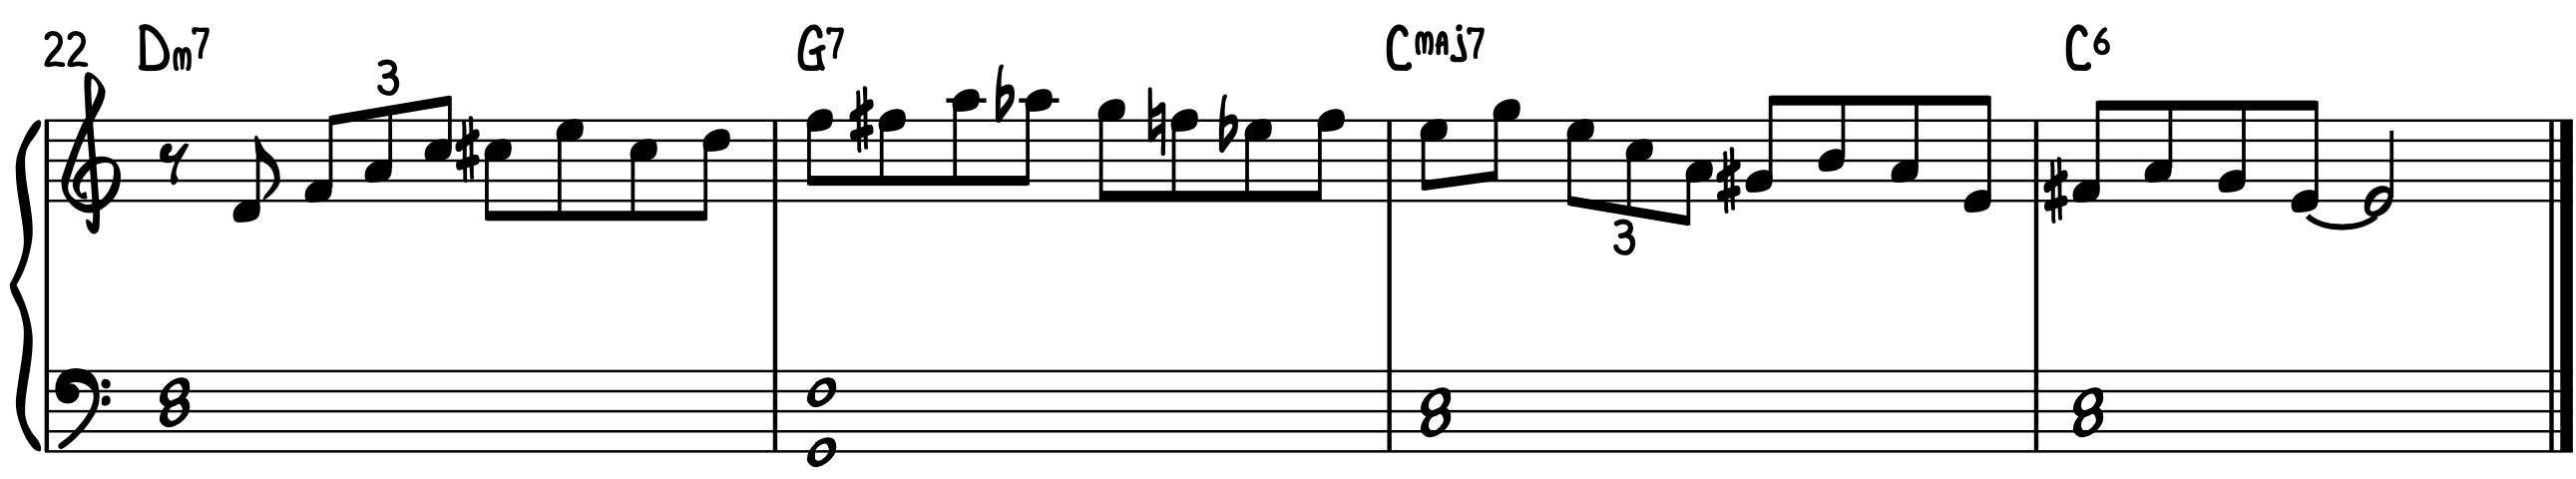 Play Bebop Piano Lines Example 2